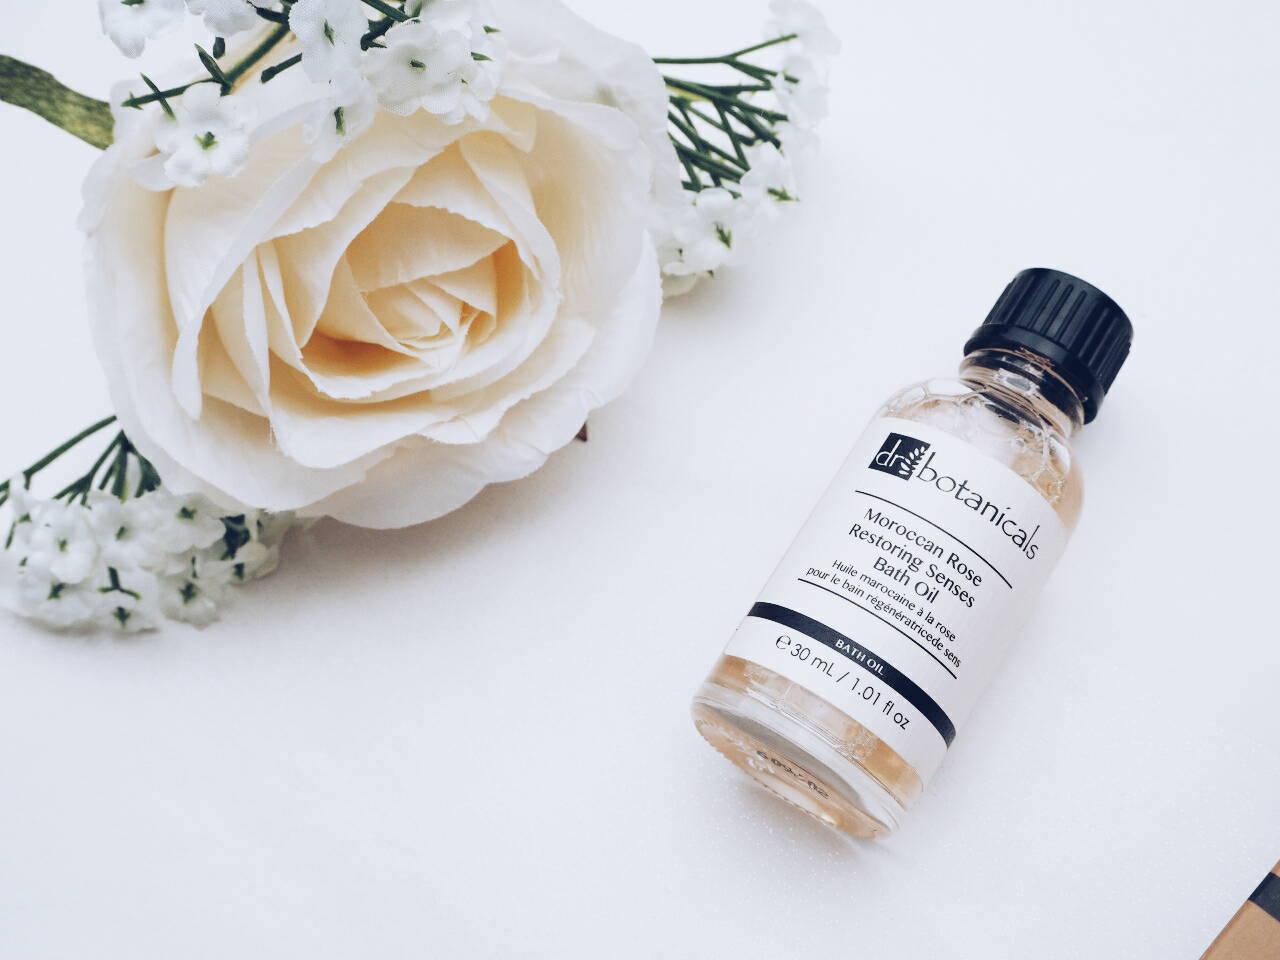 Dr Botanicals Moroccan Rose Senses Bath Oil